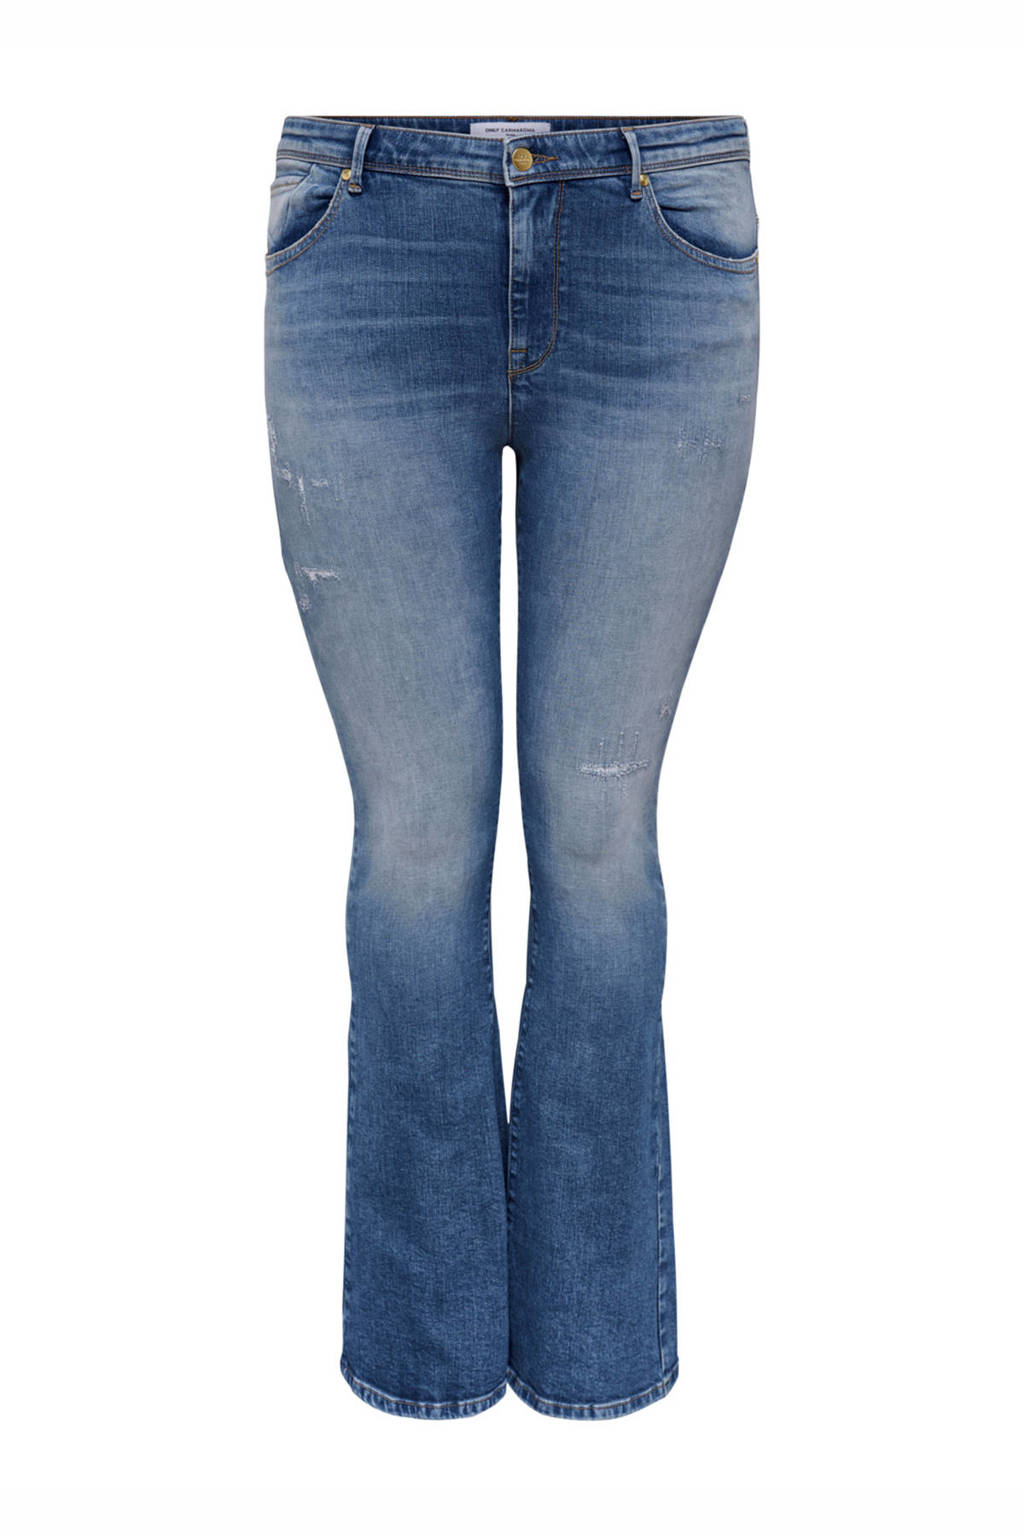 ONLY CARMAKOMA bootcut jeans Baroll blauw, Blauw